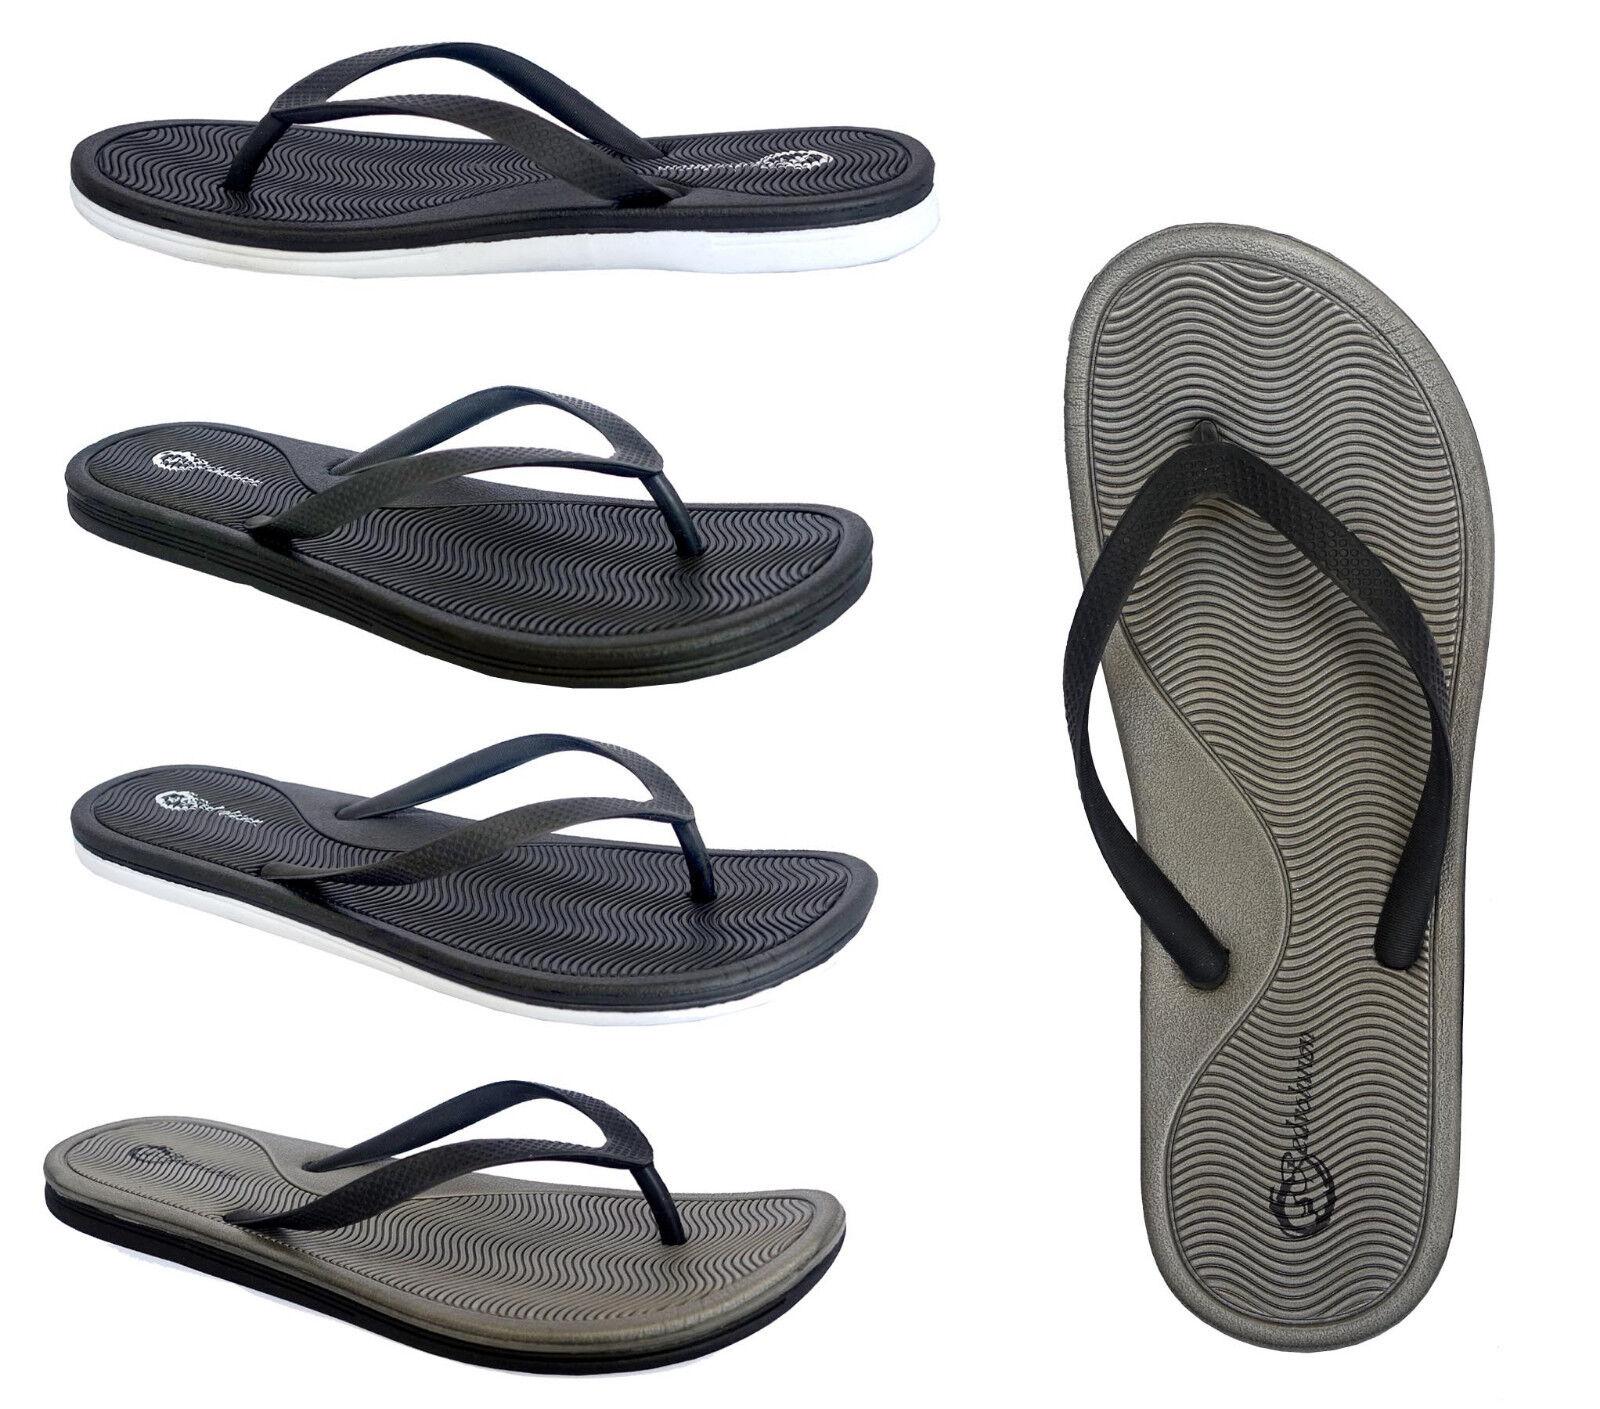 New MEN UltraSoft Beach Sandals Flexible Flip Flops --316 Water Gym Pool Beach --316 Flops beeedc